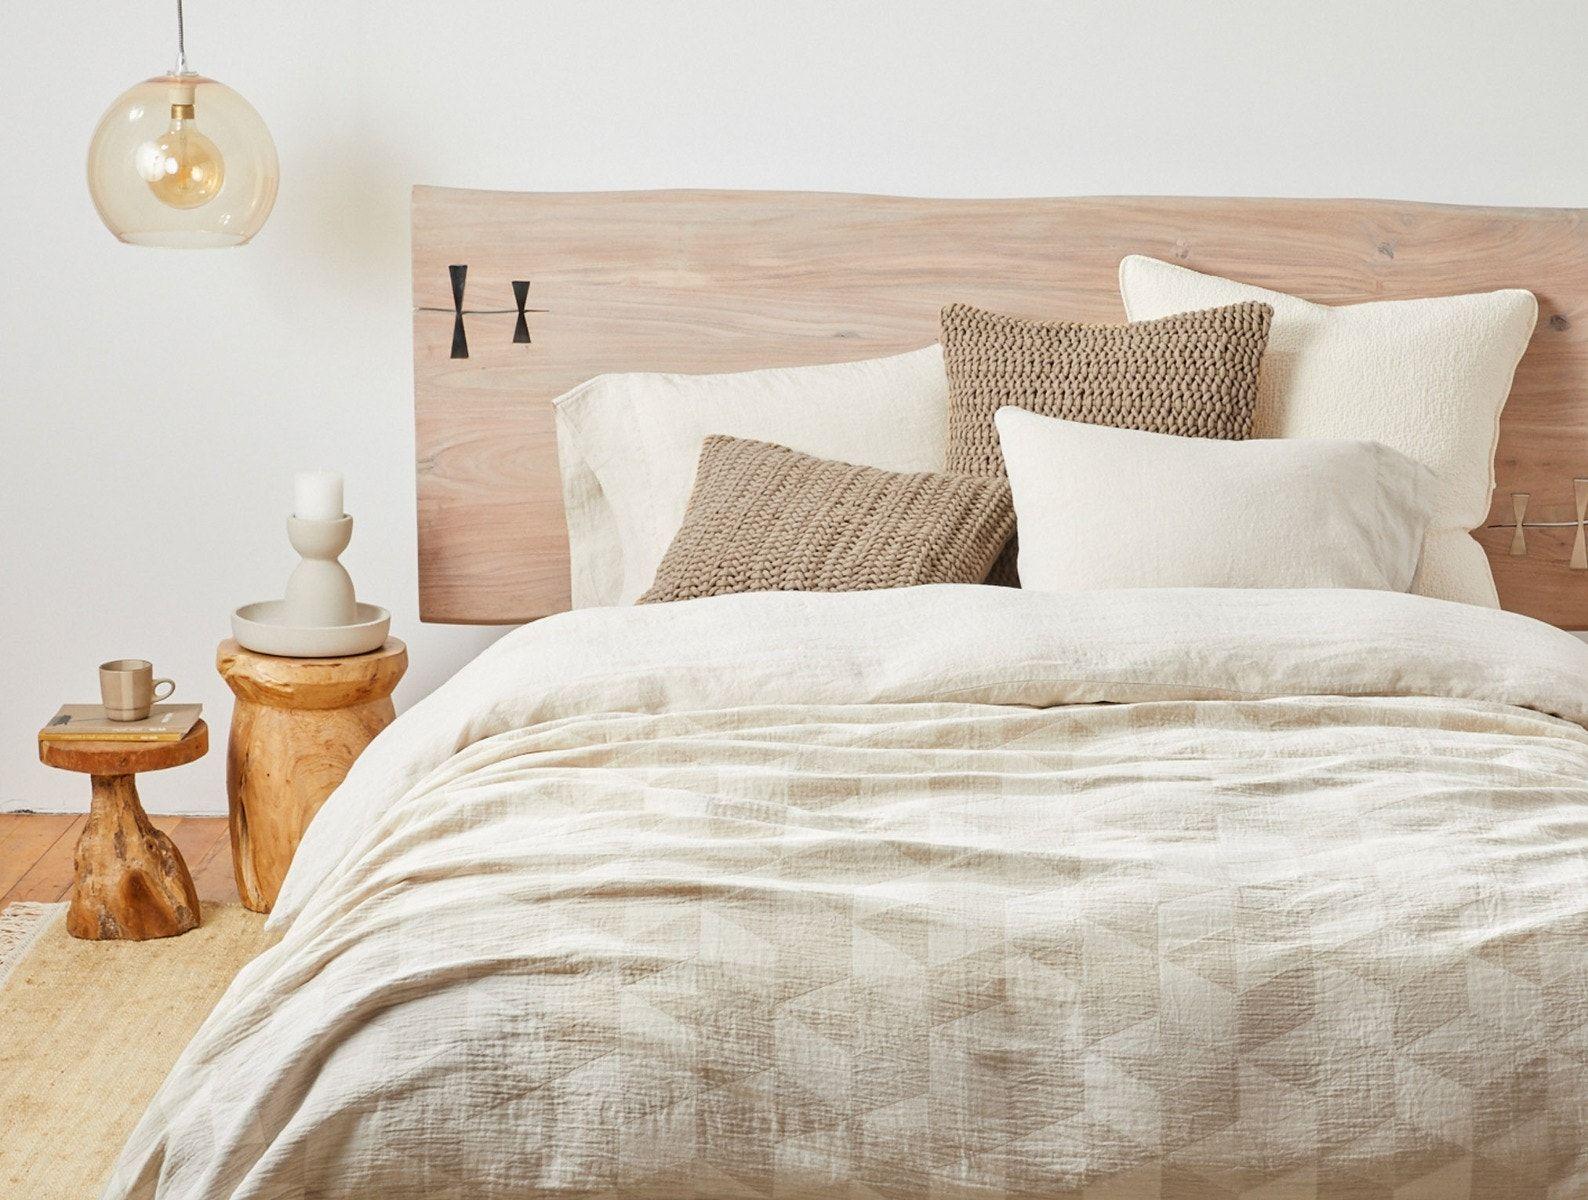 Pismo Organic Blanket In 2020 Organic Blankets Cozy Small Bedrooms Coyuchi